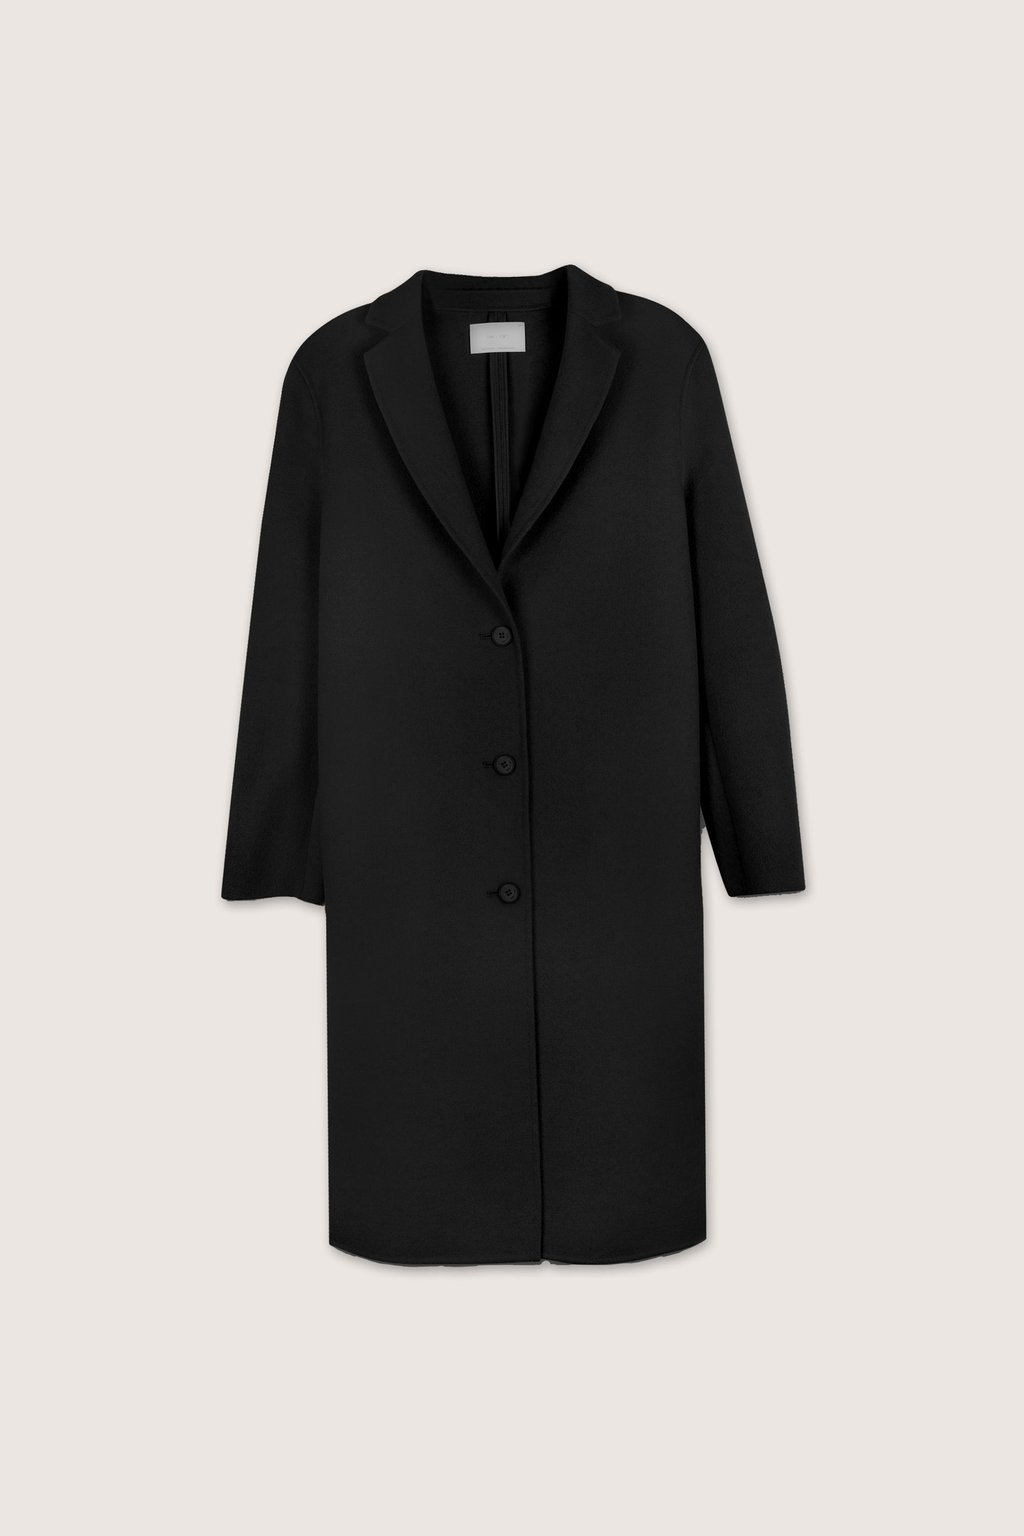 Handmade Coat 1820 Black 5